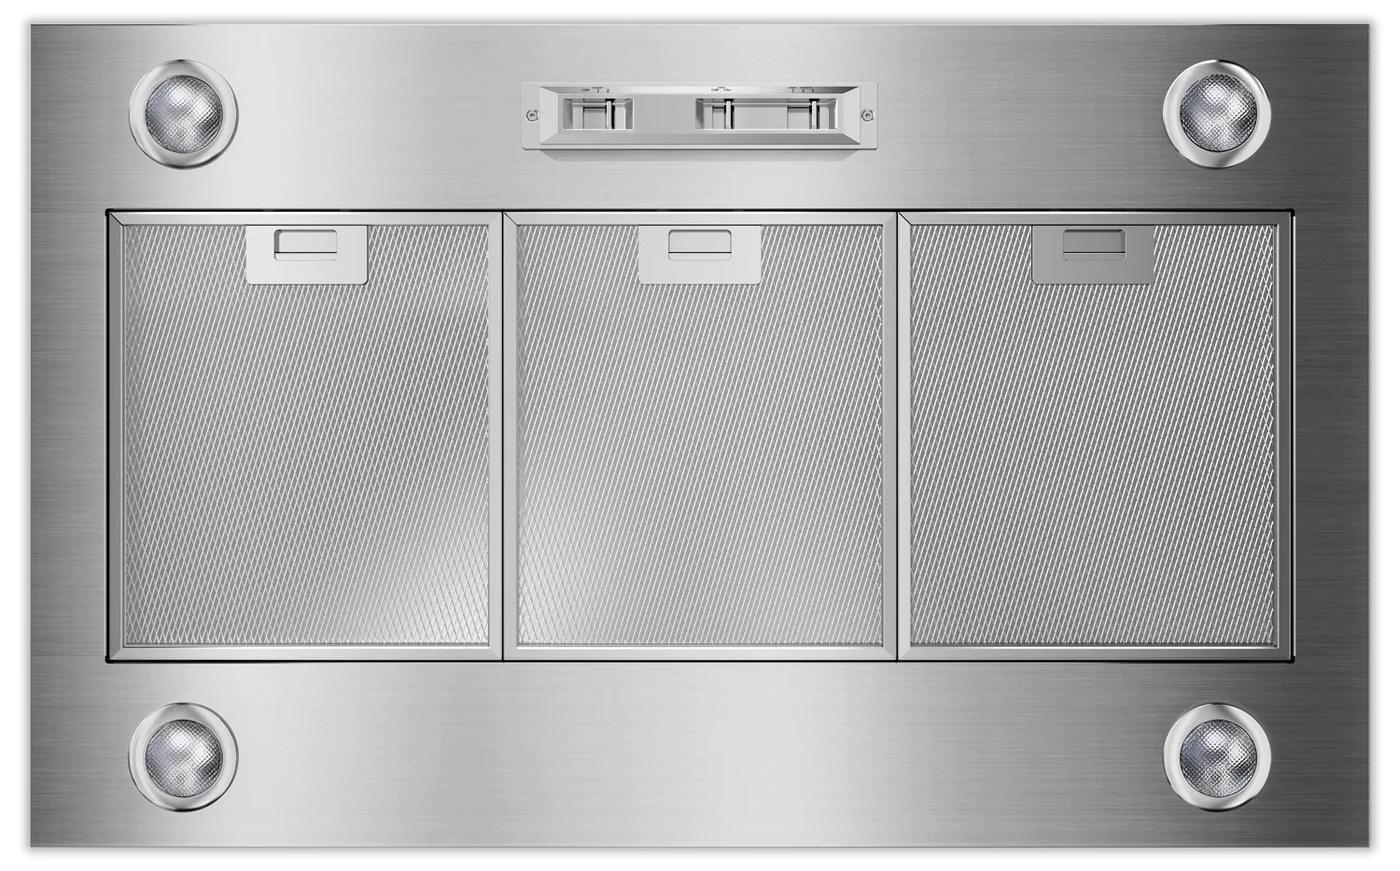 kitchen air cork floors in kitchenaid stainless steel 36 1200 range hood liner uxl6036yss